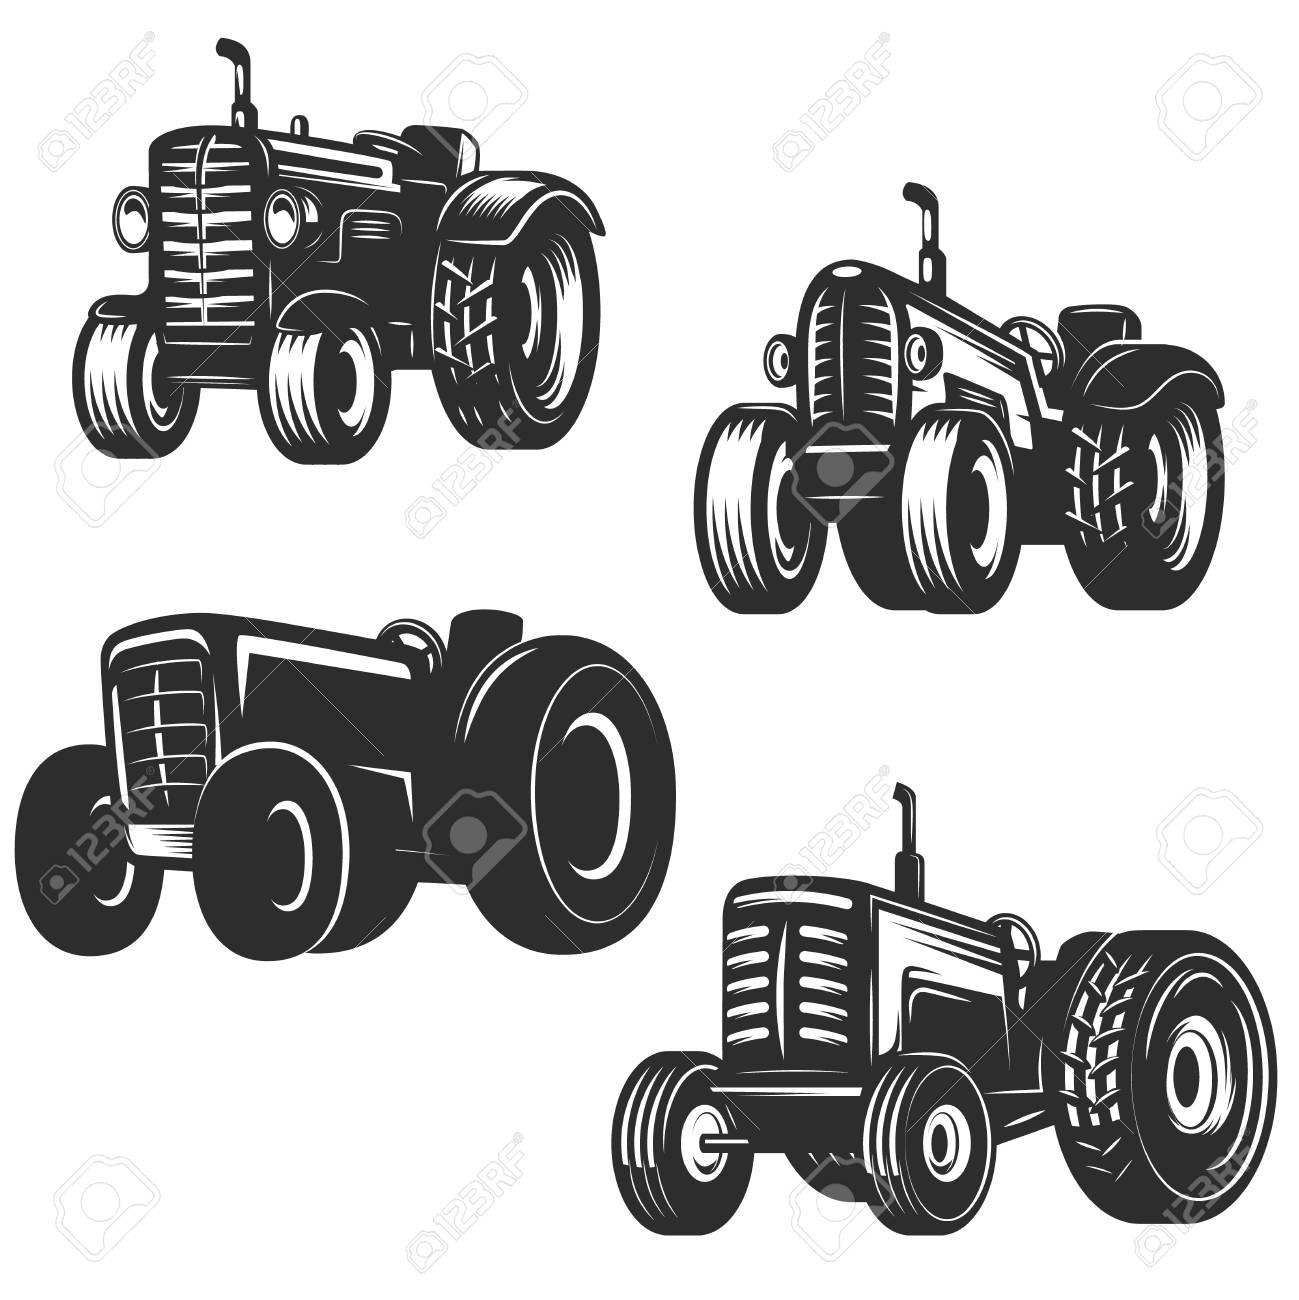 Set of retro tractor icons. Design elements for logo, label, emblem, sign. Vector illustration - 88311389